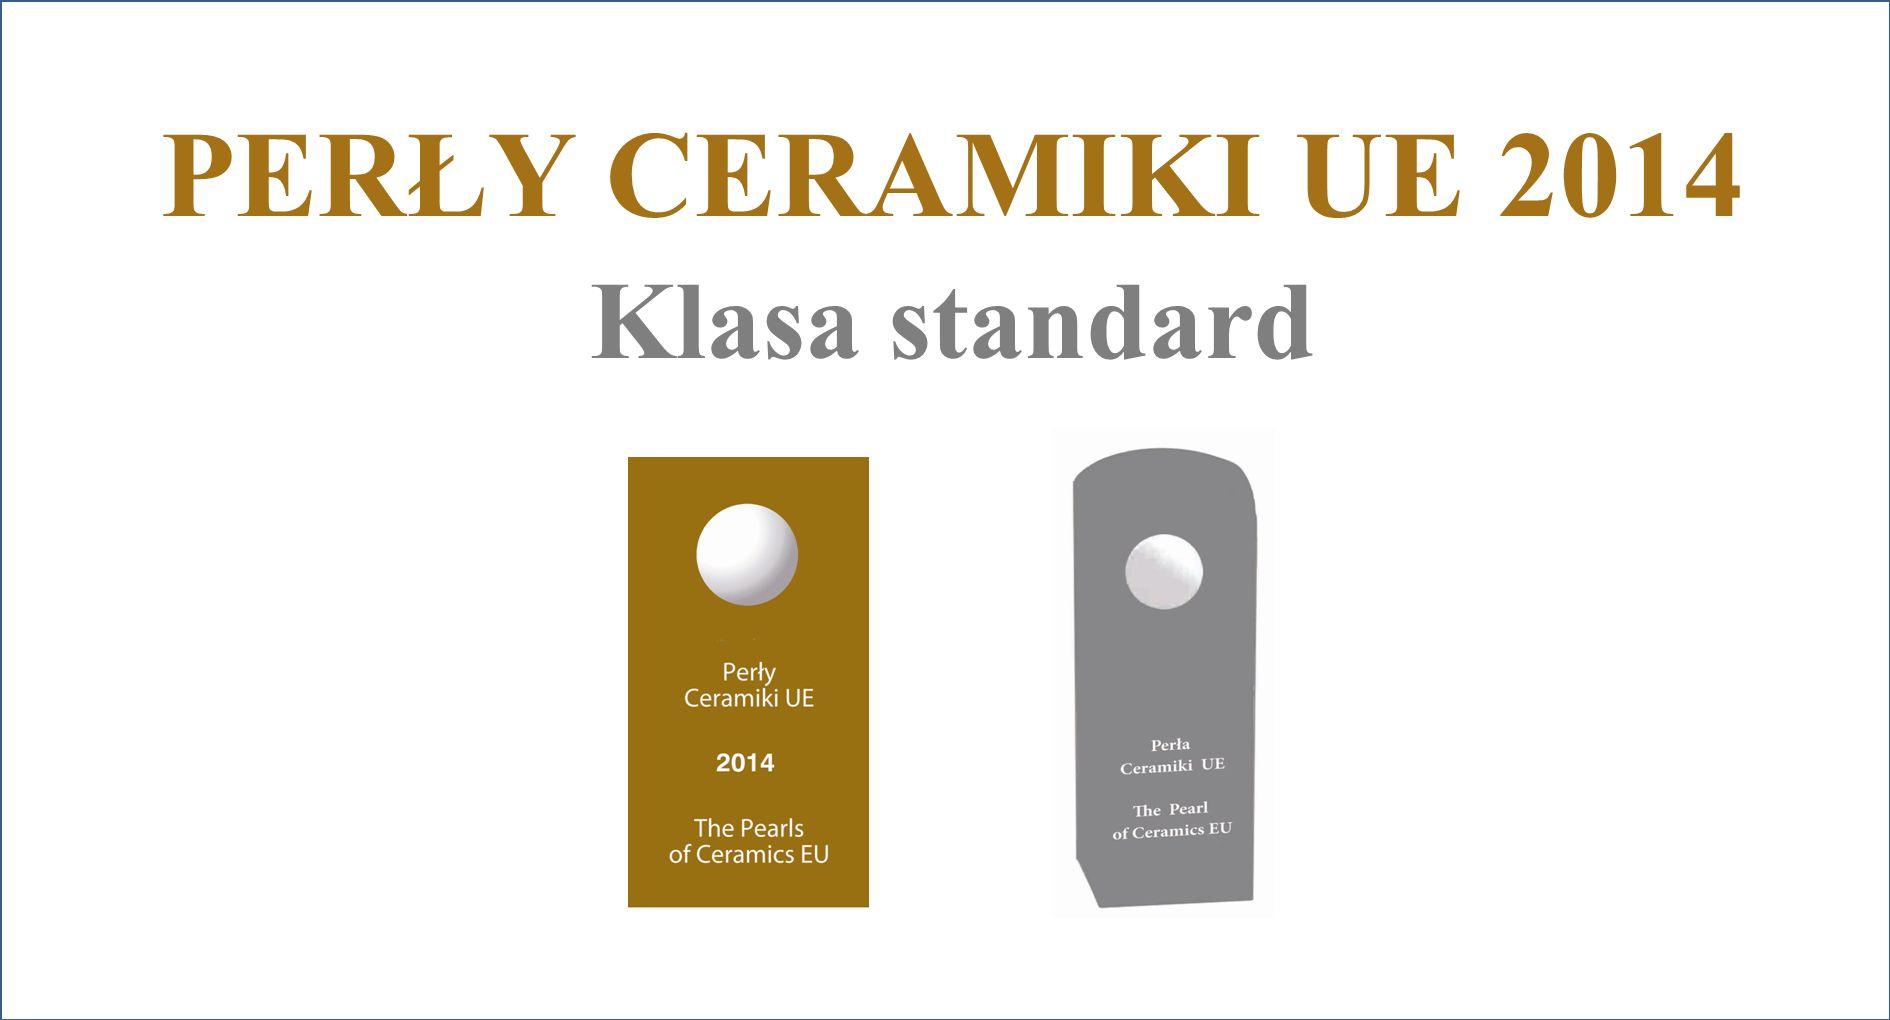 PERŁY CERAMIKI UE 2014 Klasa standard